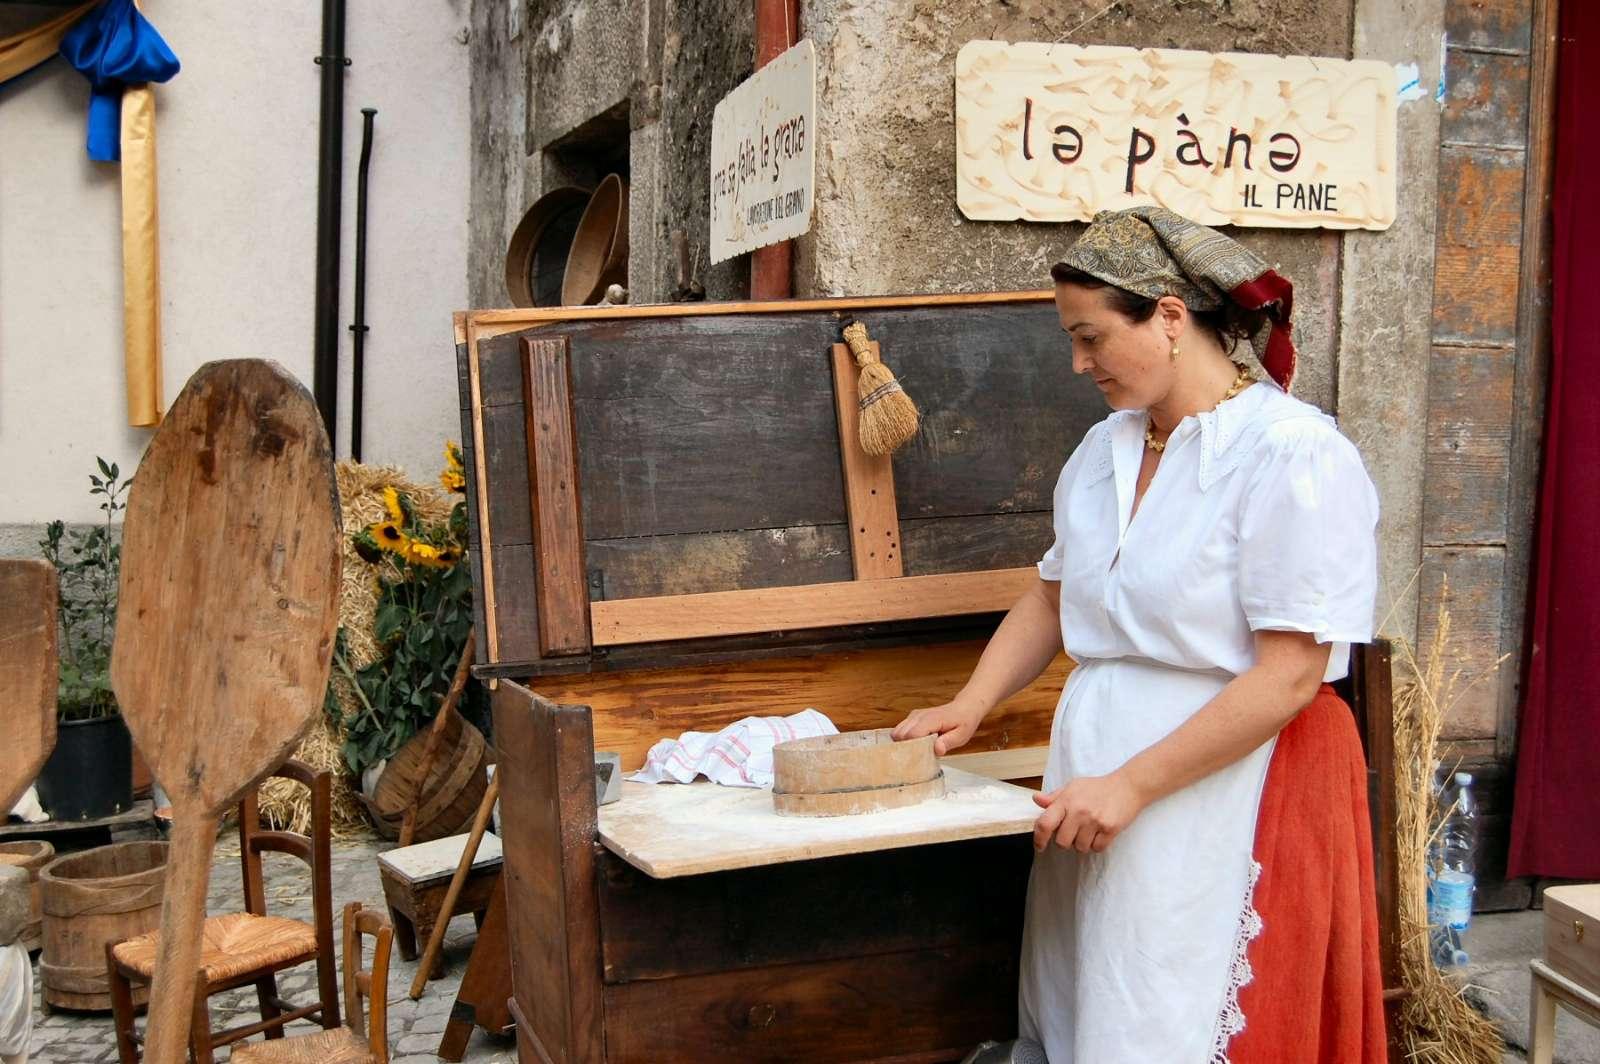 Den lokale byfest for håndværkstraditioner: La Festa degli antichi mestieri